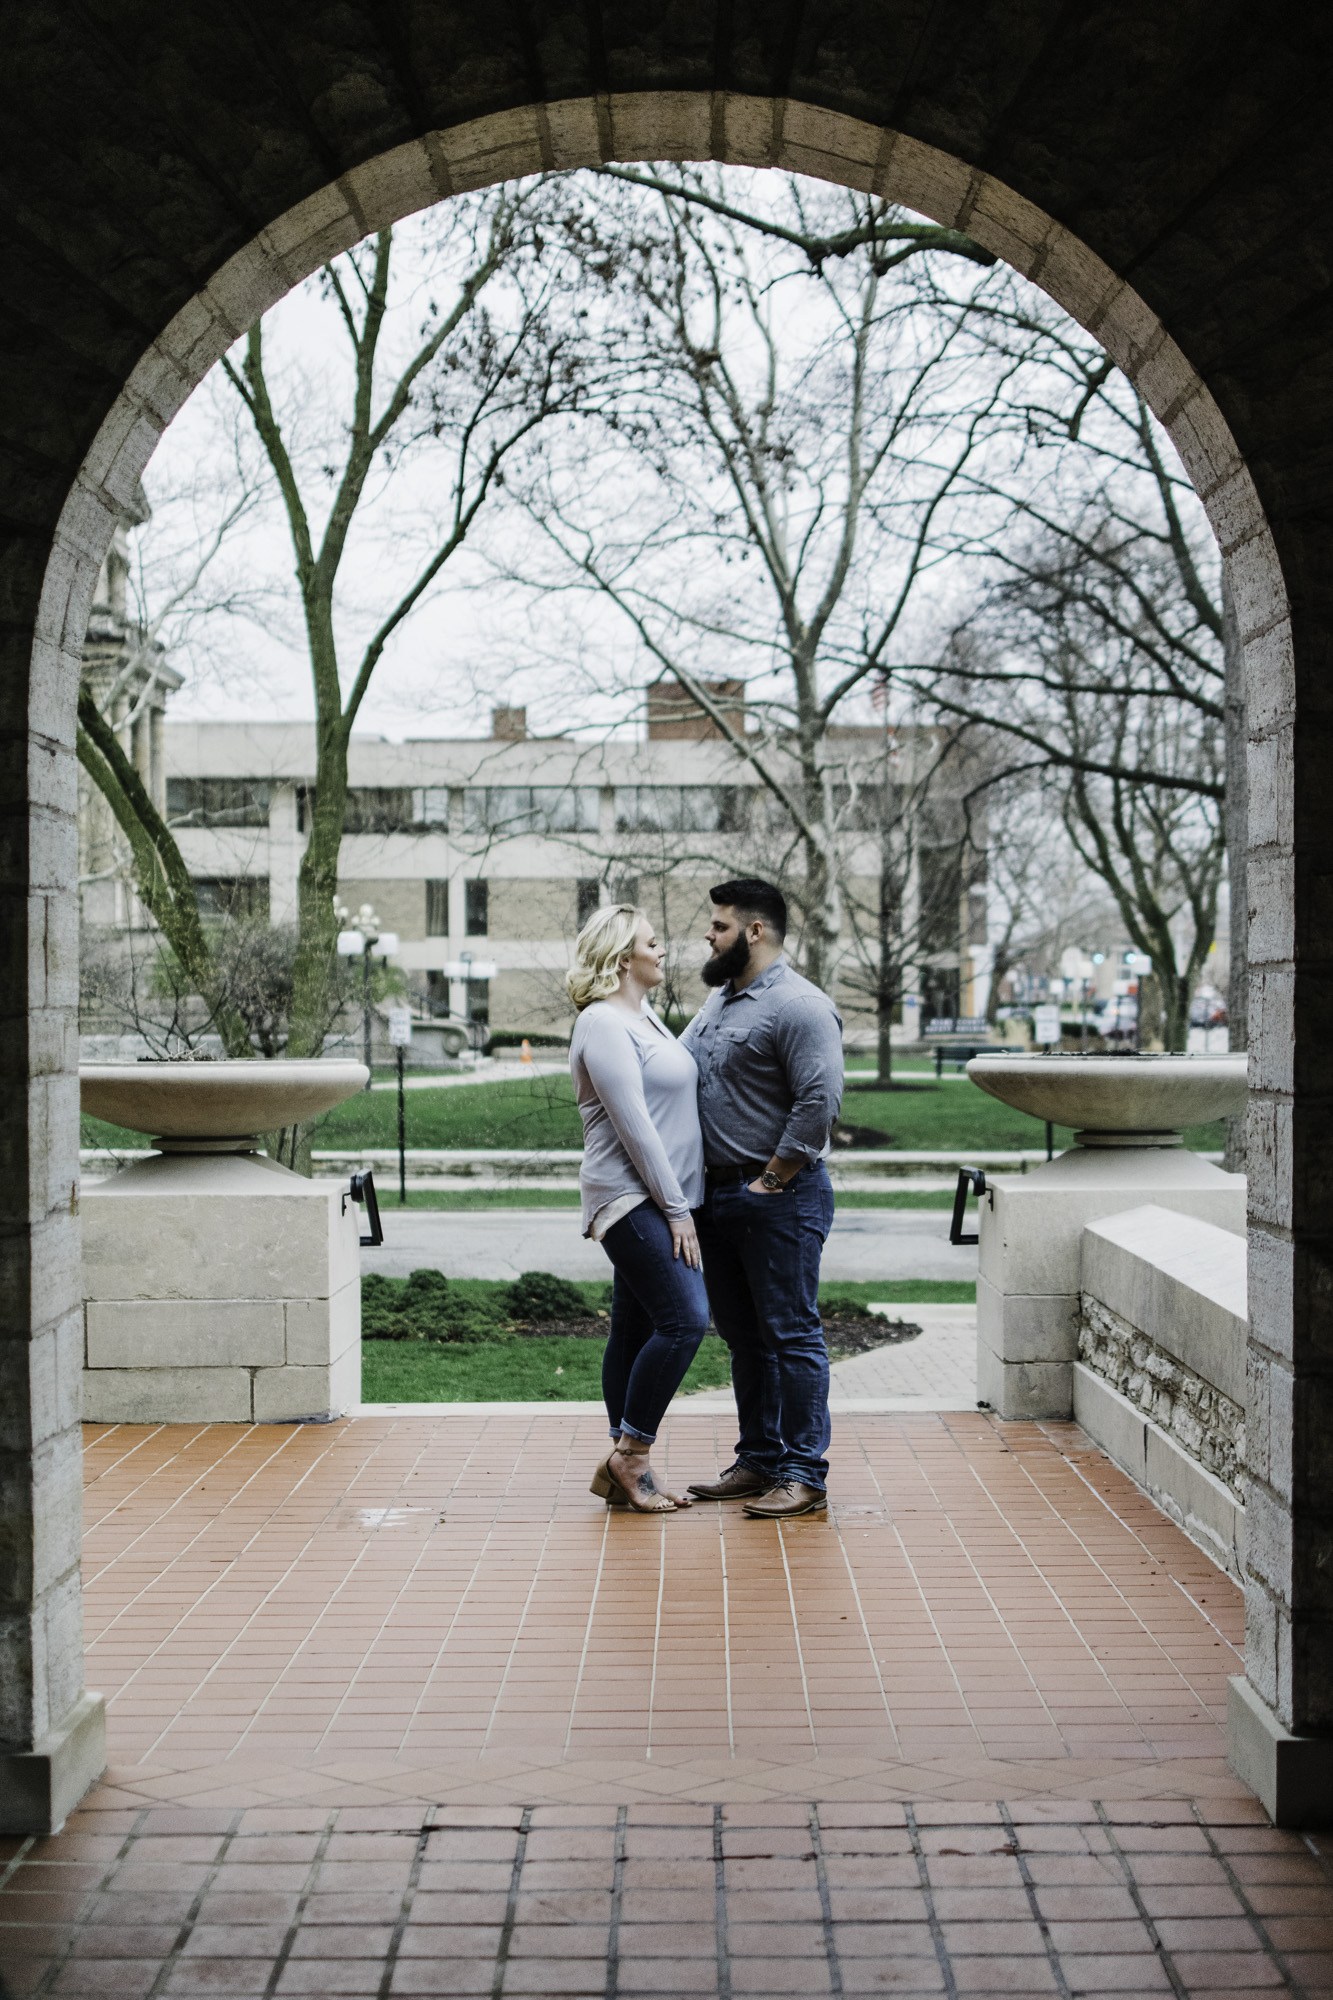 Cate_Ann_Photography_Dayton_Ohio_Wedding_And_Engagement_PhotographerDSC_2710.jpg